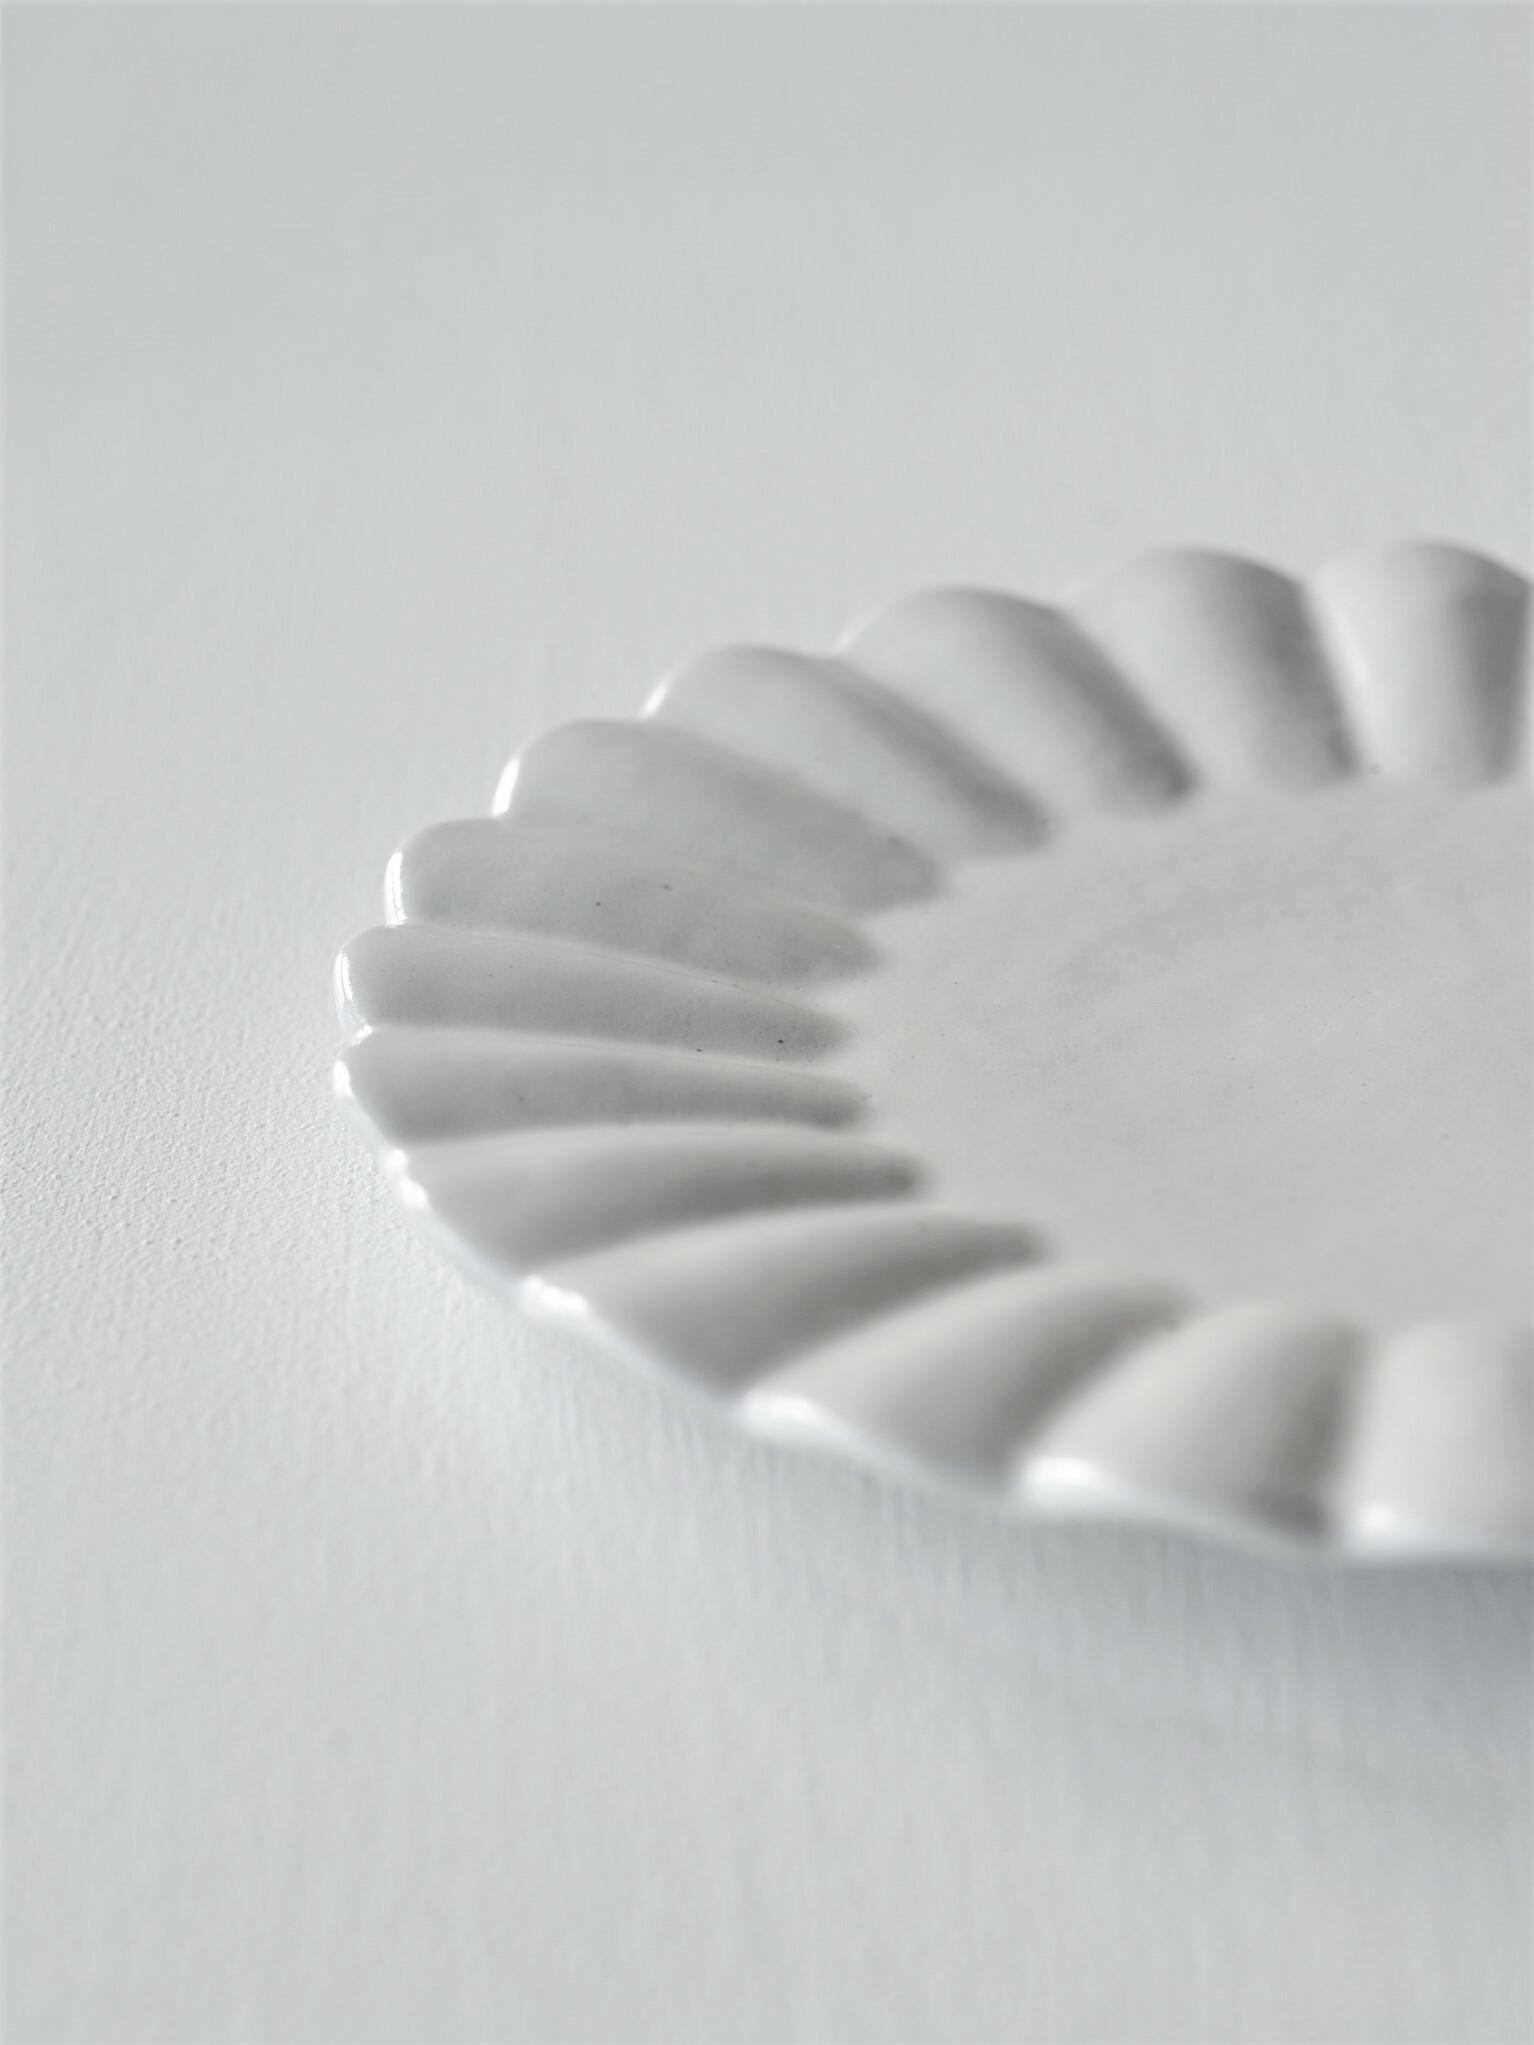 安部太一 白釉輪花皿大 taichi abe-white glaze flower shaped plate large